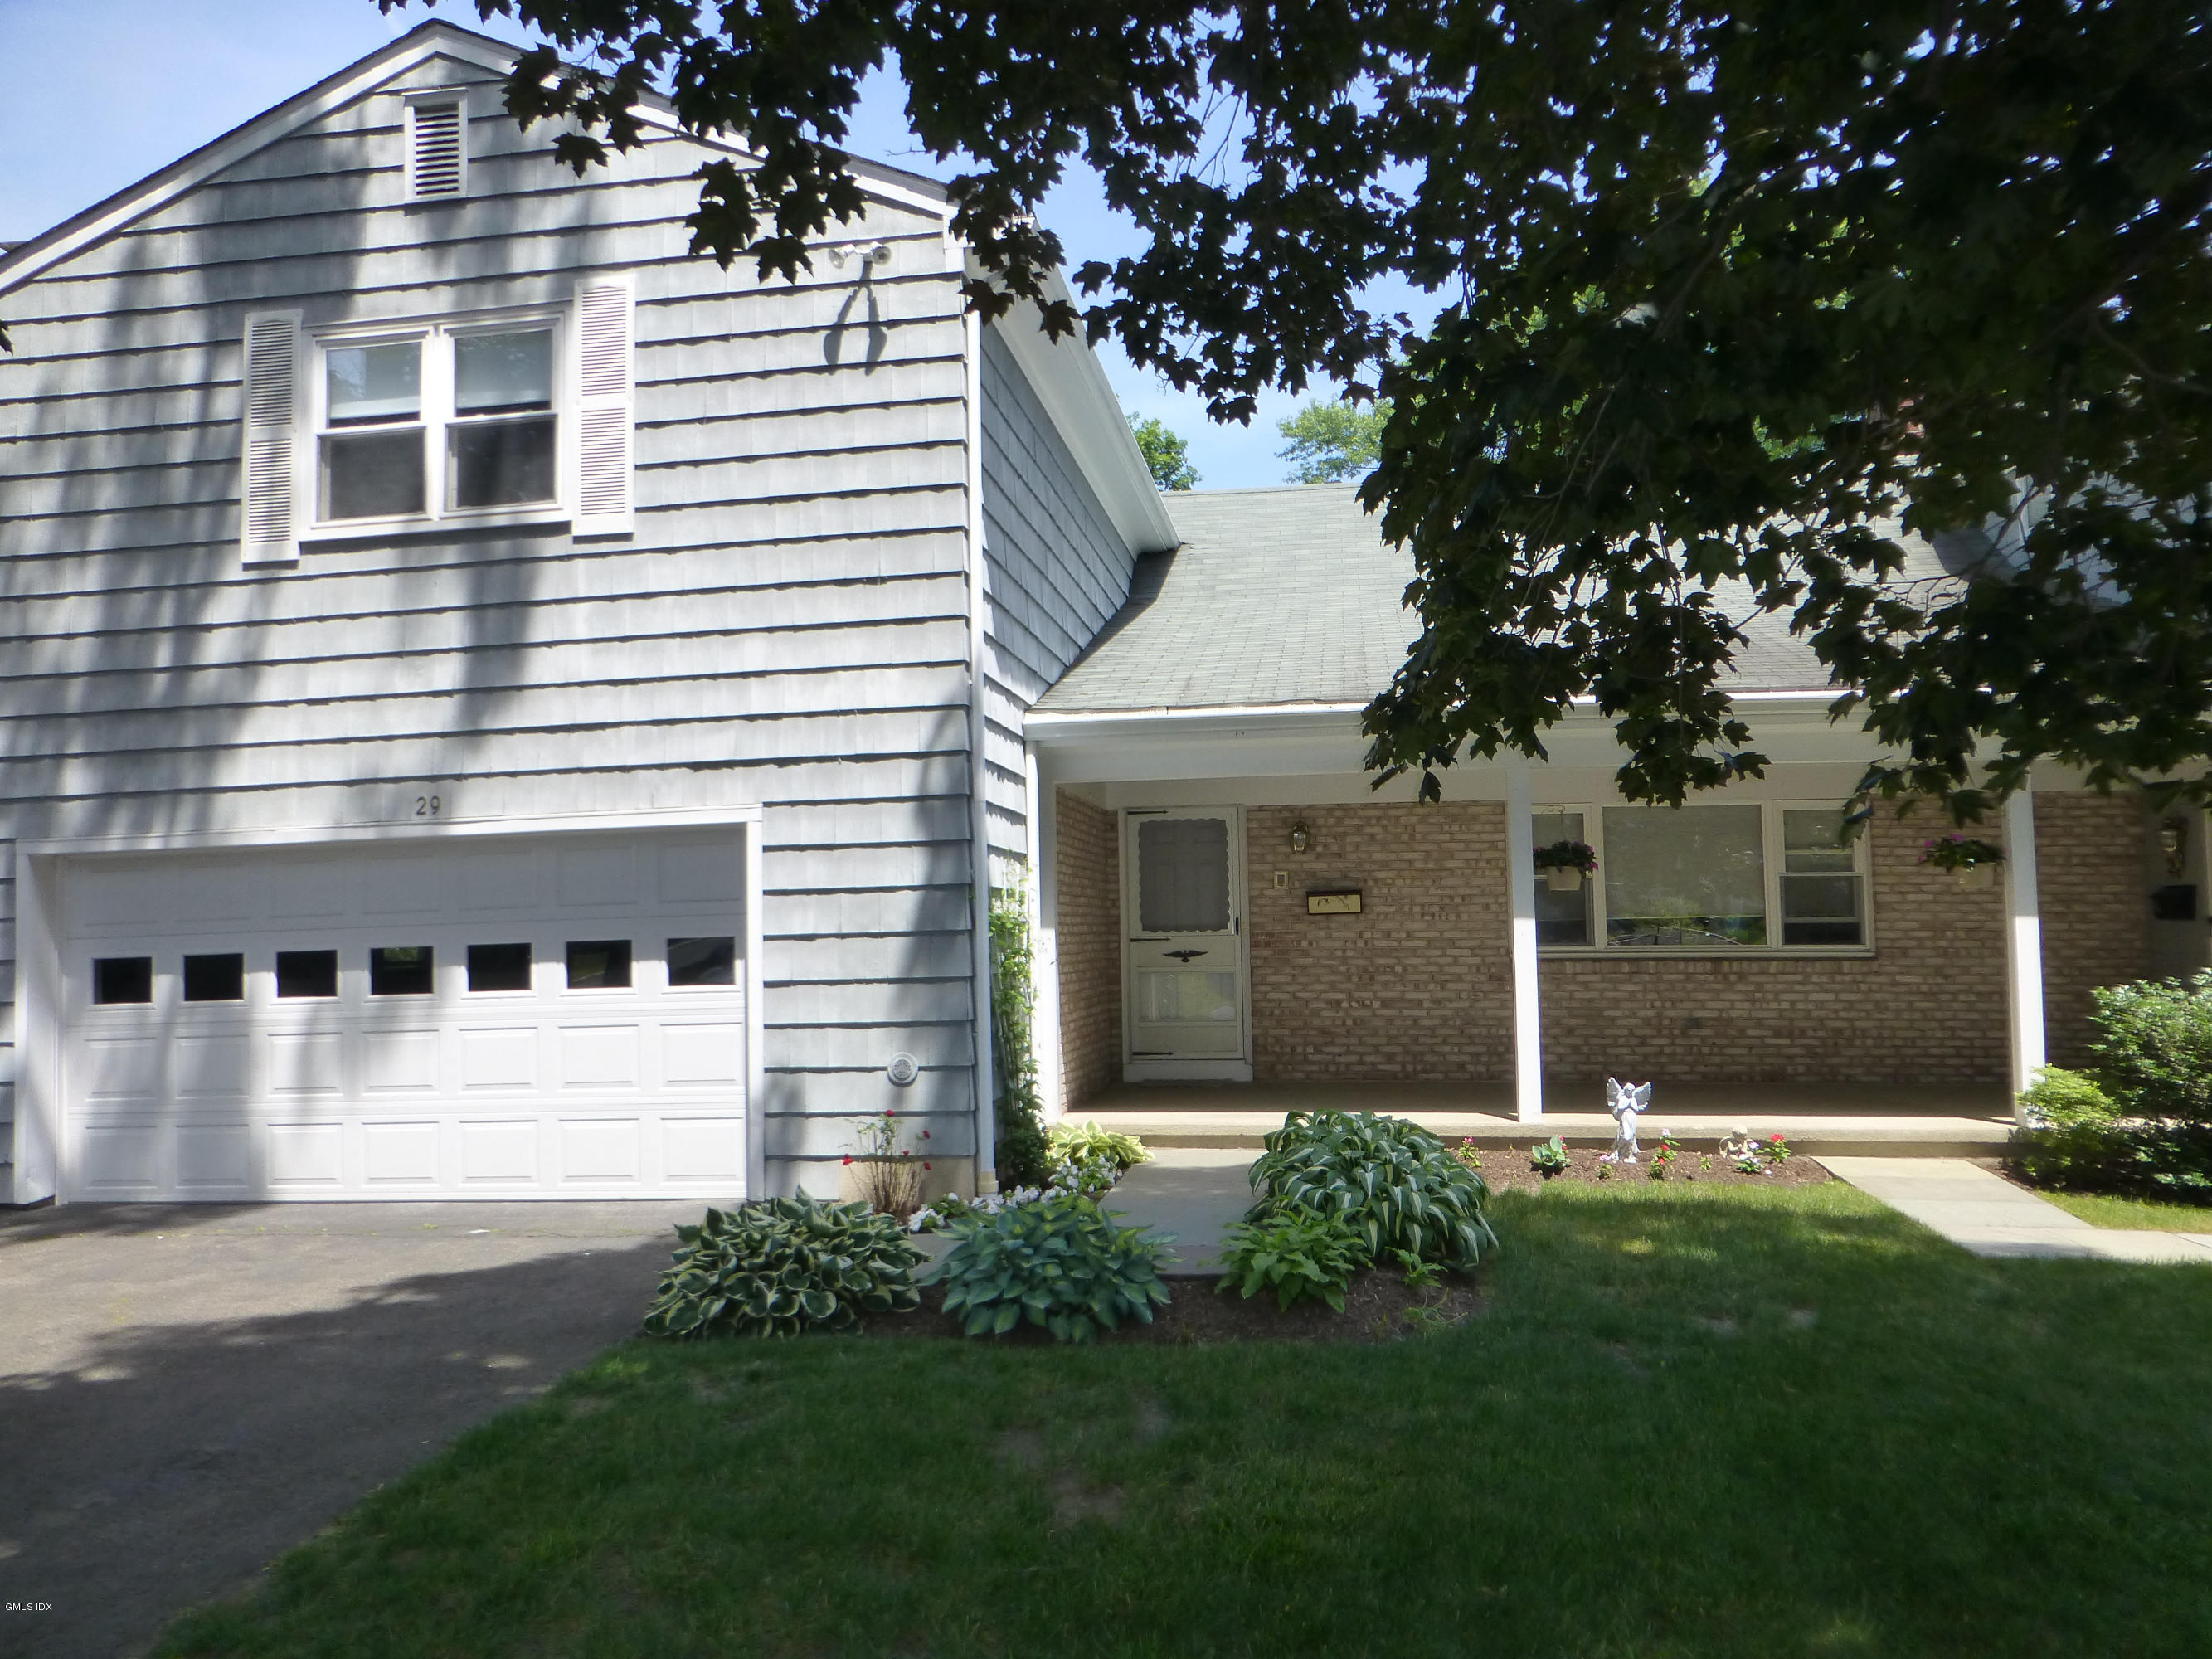 29 Maplewood Drive,Cos Cob,Connecticut 06807,7 Bedrooms Bedrooms,5 BathroomsBathrooms,Single family,Maplewood,107343